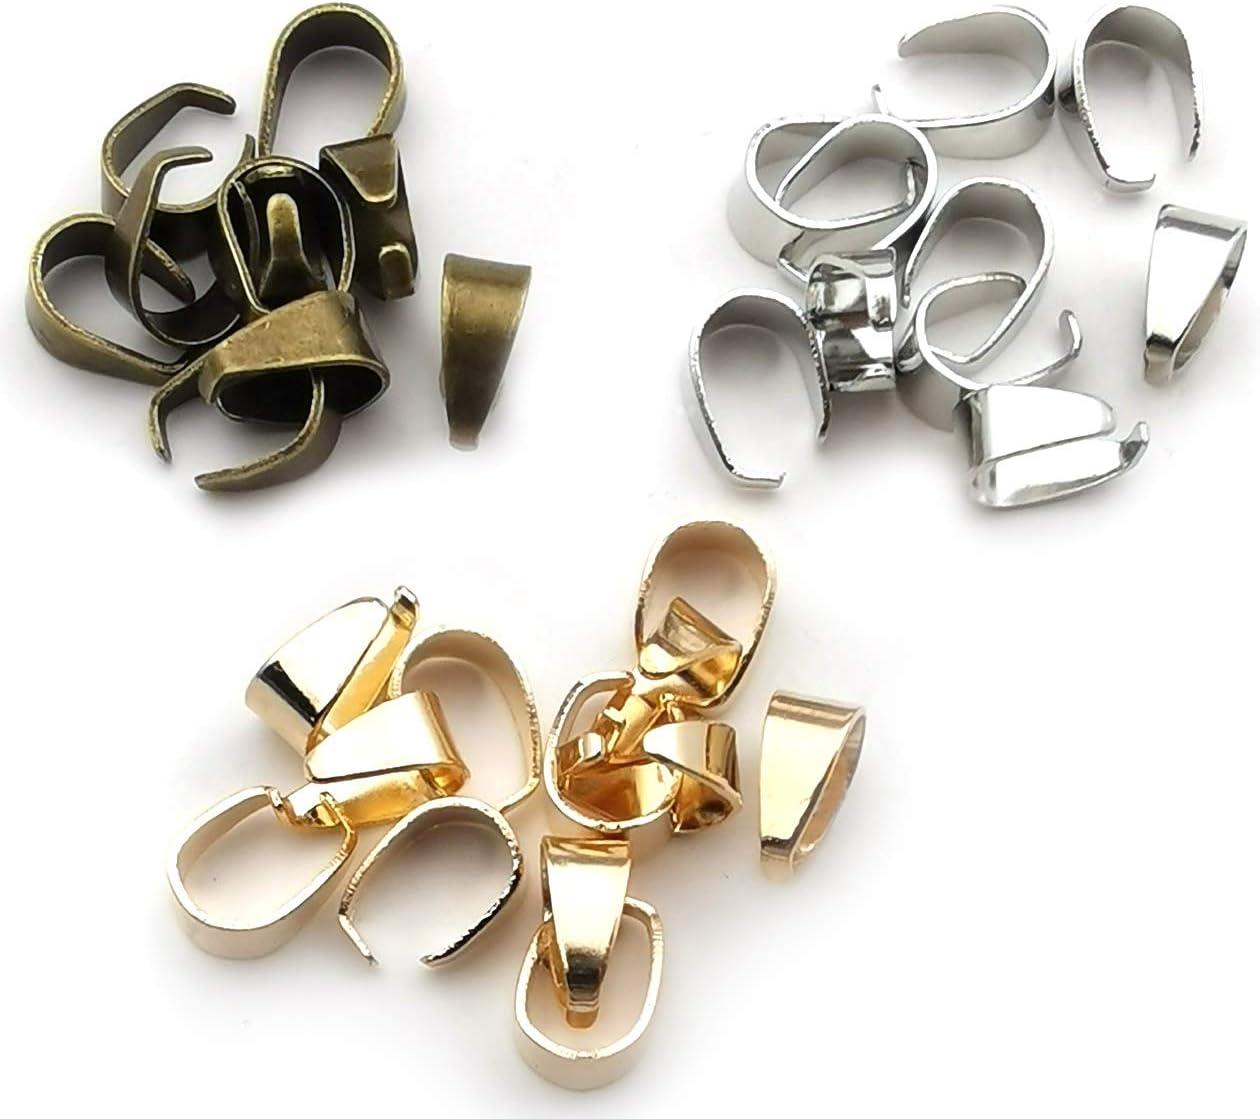 300pcs Metal Pinch Clip Clasp Bail Metal Finish Necklace Clasps Pendant Clasps Claw Bail,Pendant Clasps Pinch Clip Clasp Bail for Necklace c8634 KC Gold